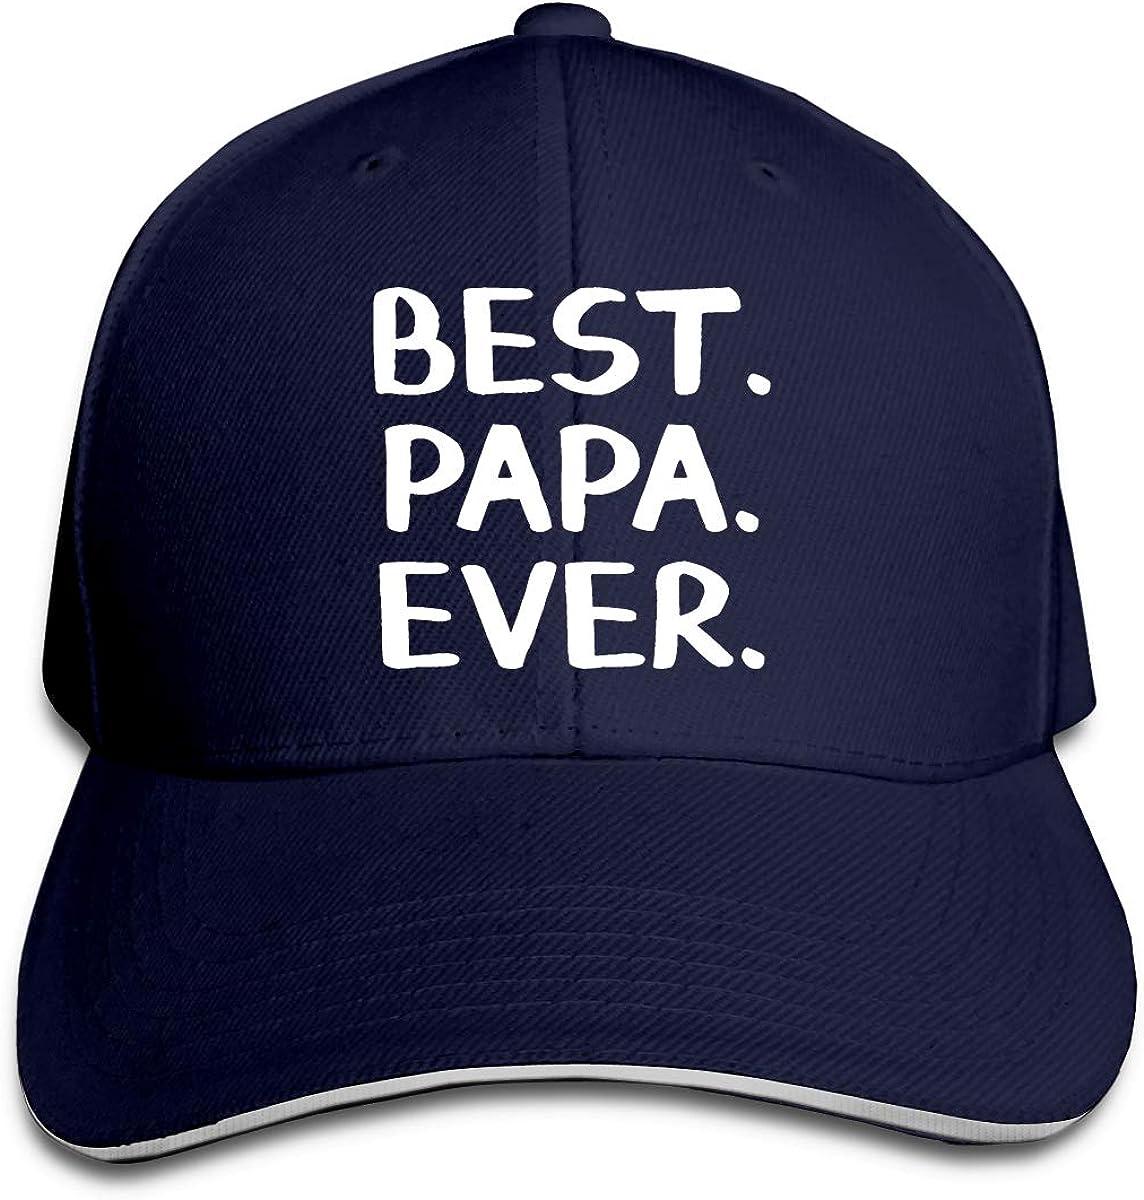 Best Papa Ever Dad Hat Adjustable Casquette Cap